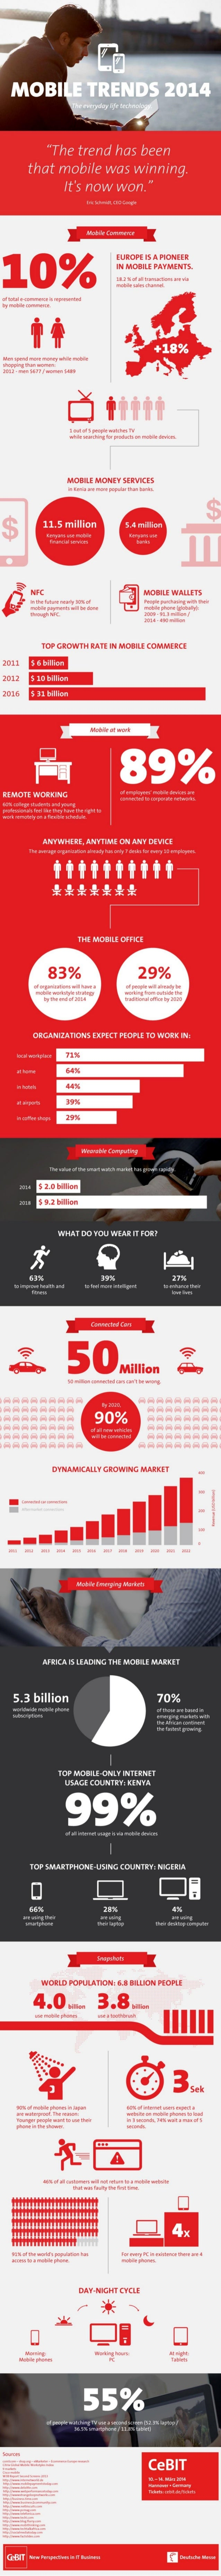 CeBIT Mobile Trends 2014